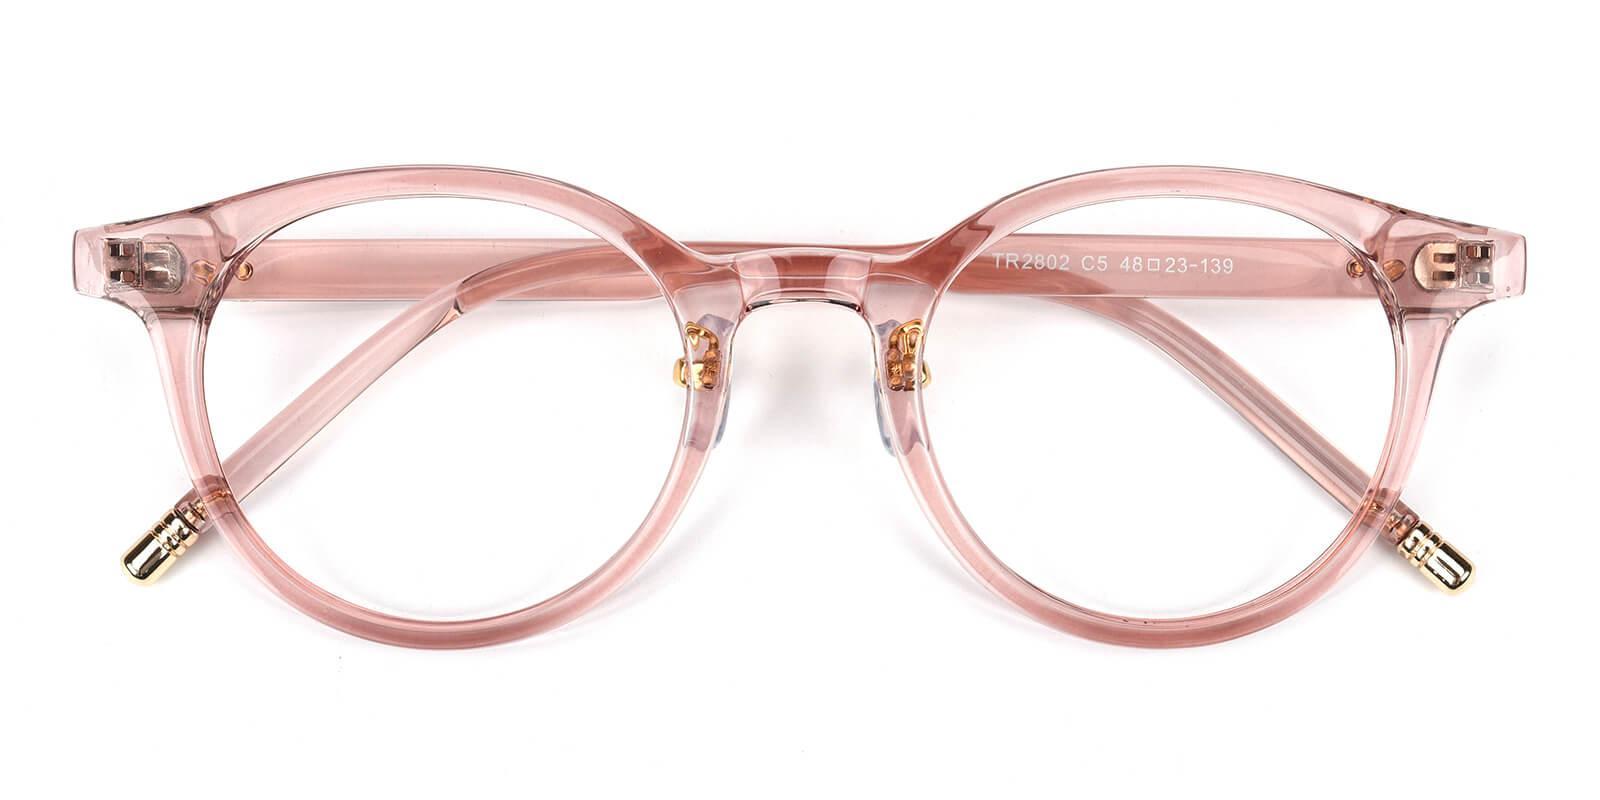 Kron-Pink-Round-TR-Eyeglasses-detail